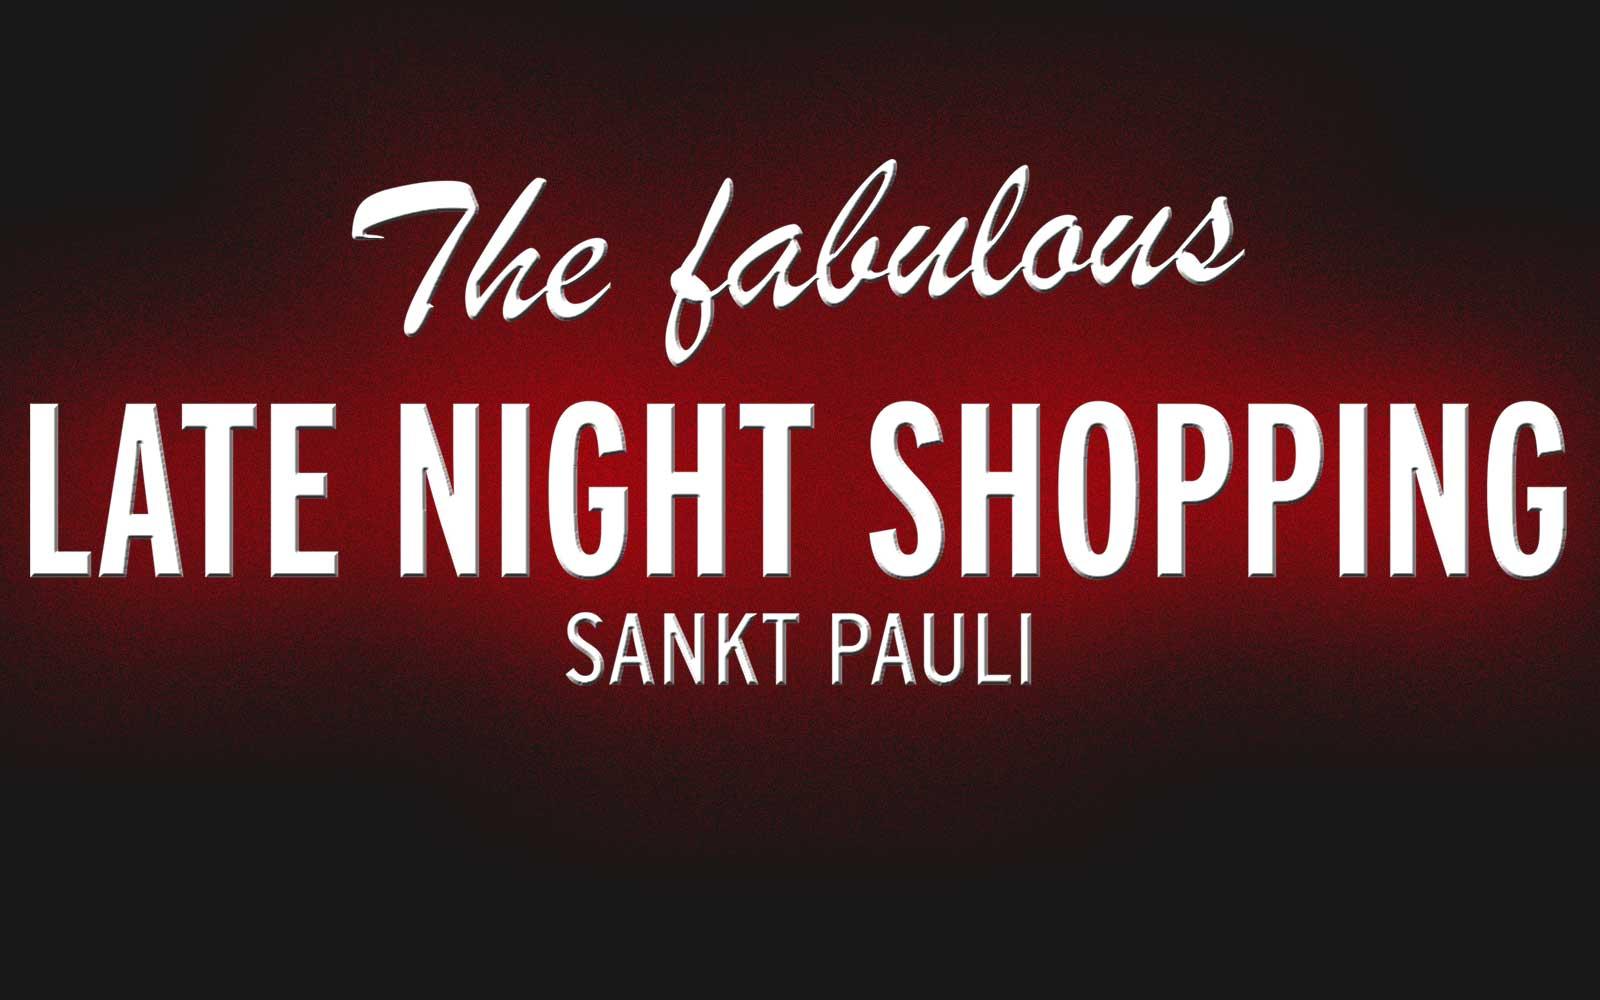 Late Night Shopping in den Fanshops